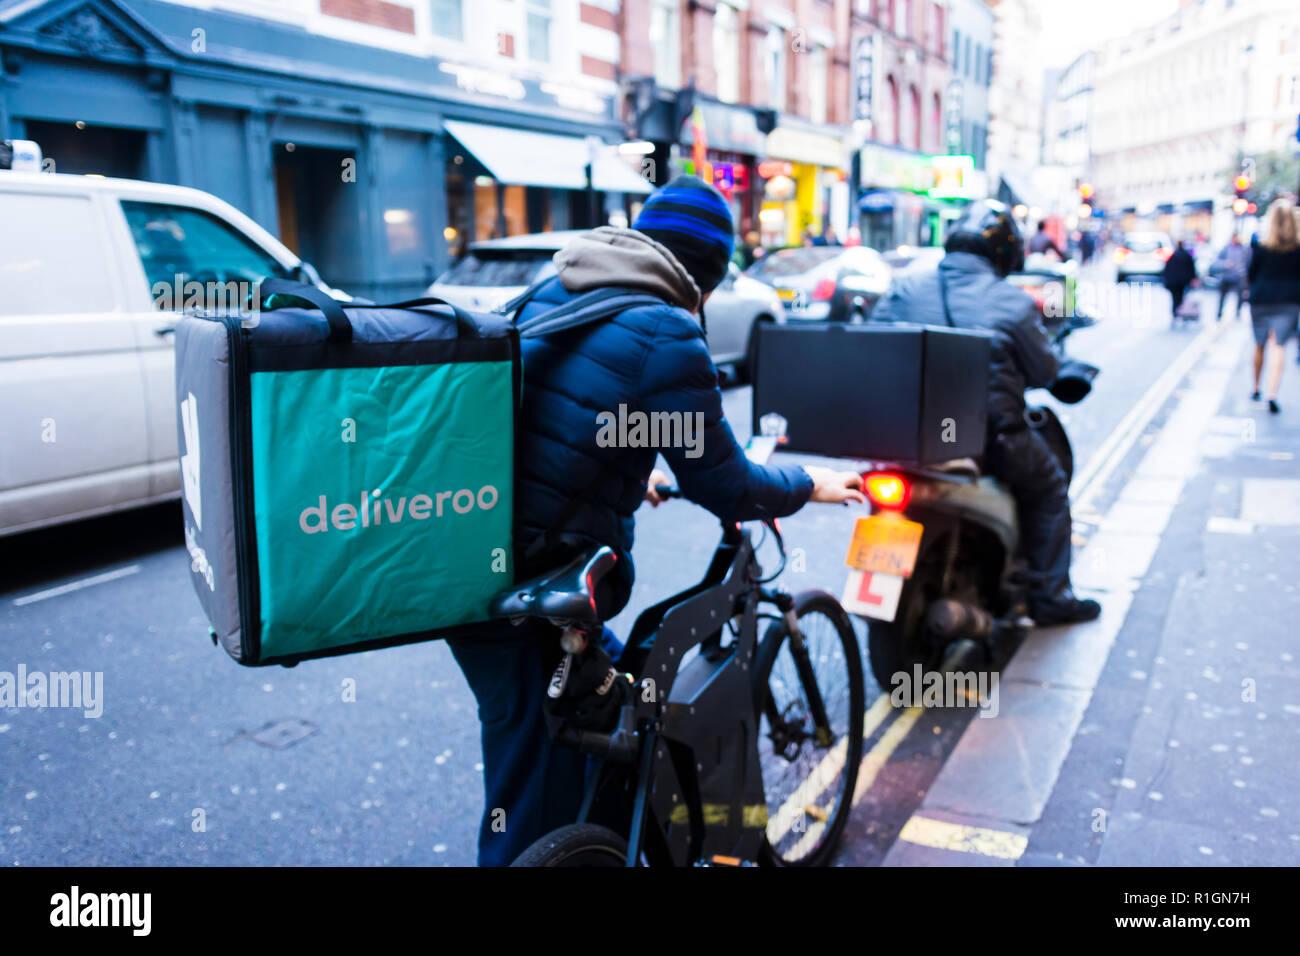 Deliveroo Food Delivery Bikes. London, England, United Kingdom. - Stock Image